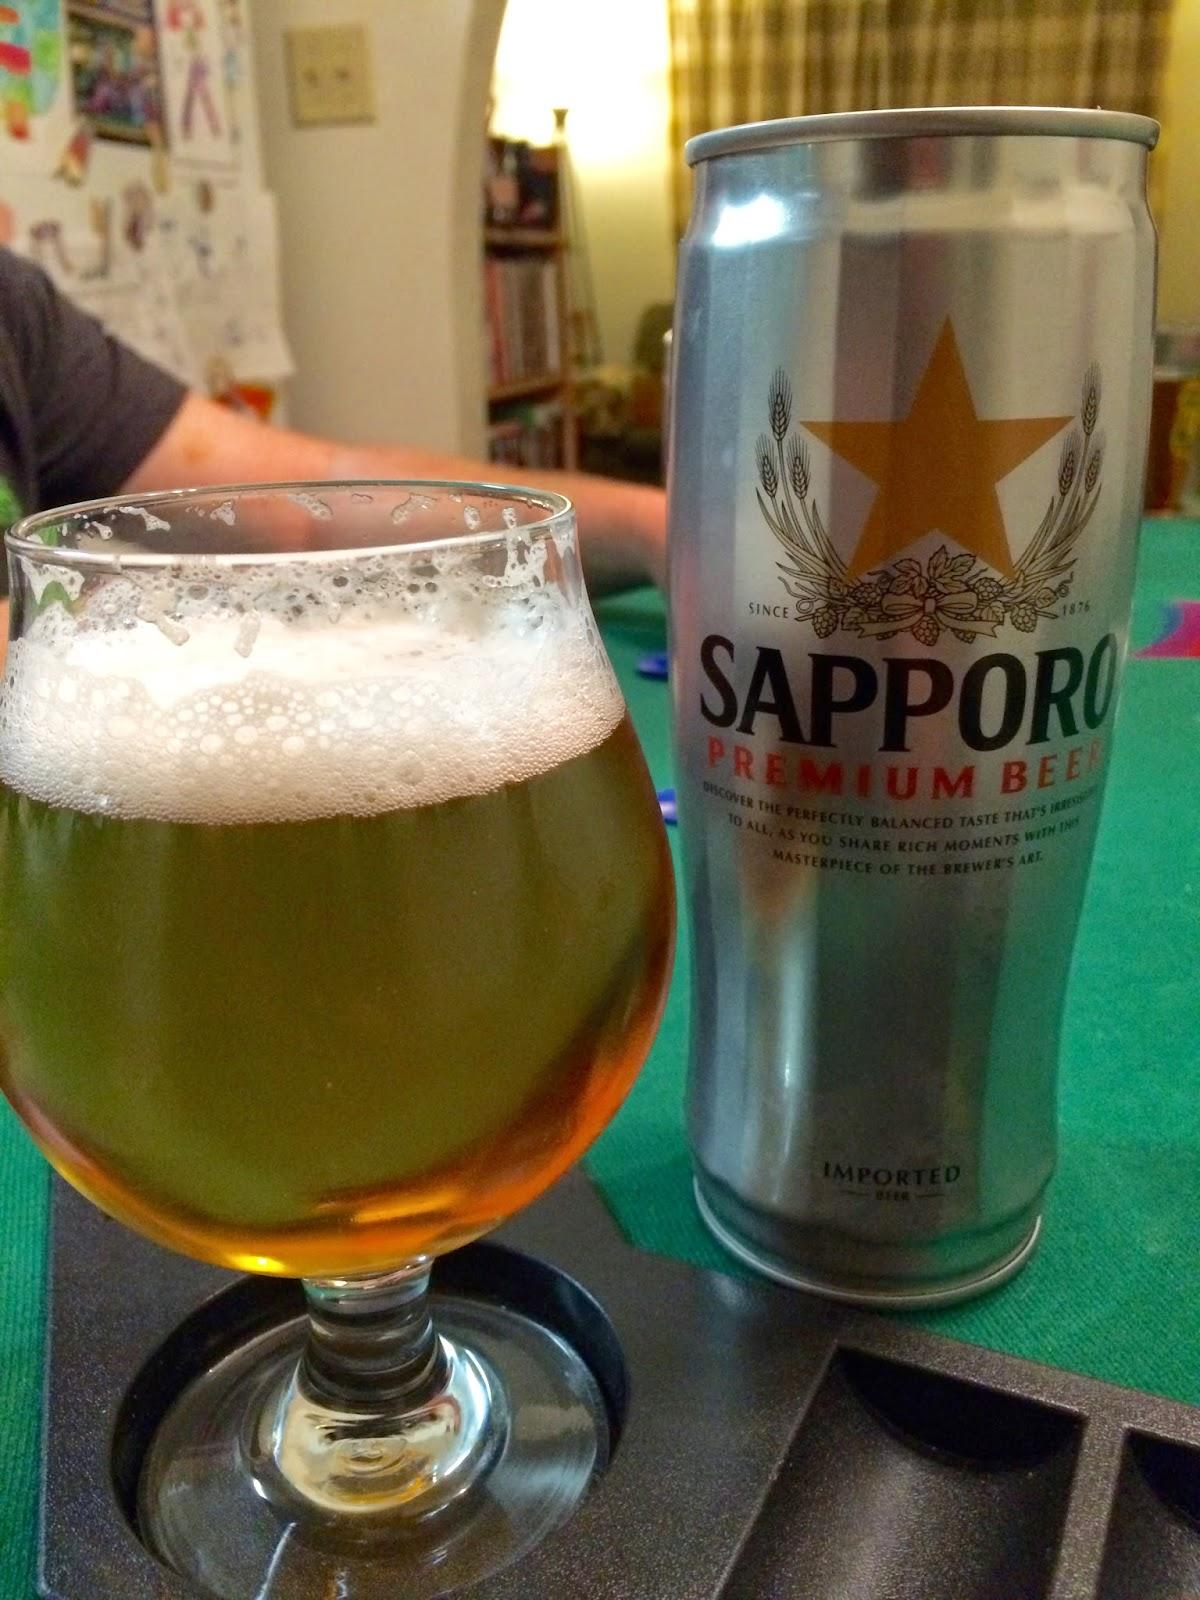 Sapporo Premium Beer 1